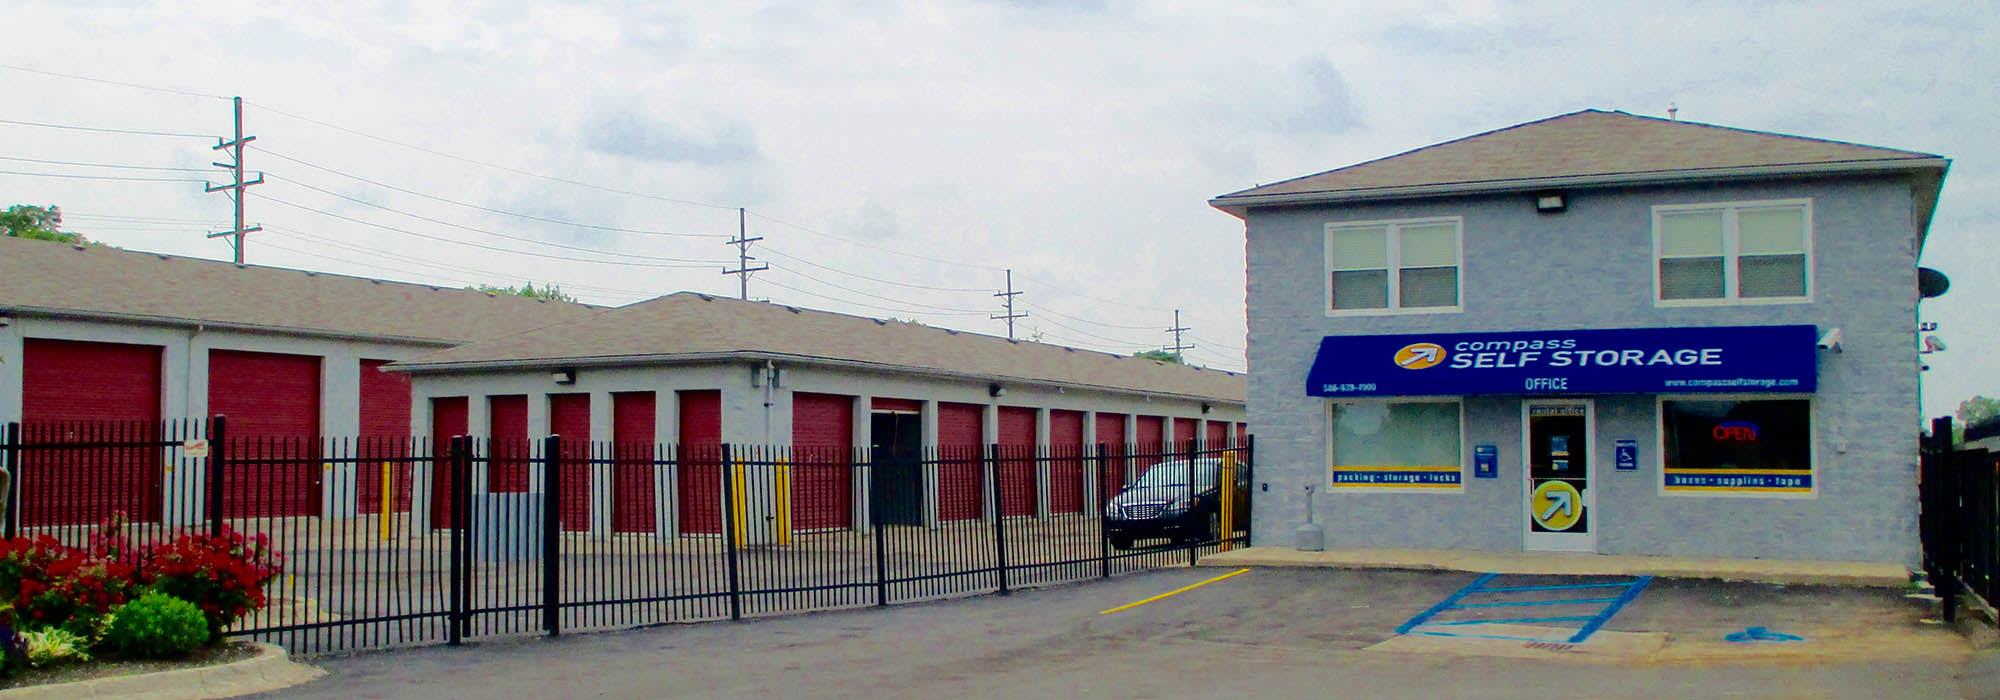 Self storage in Warren MI